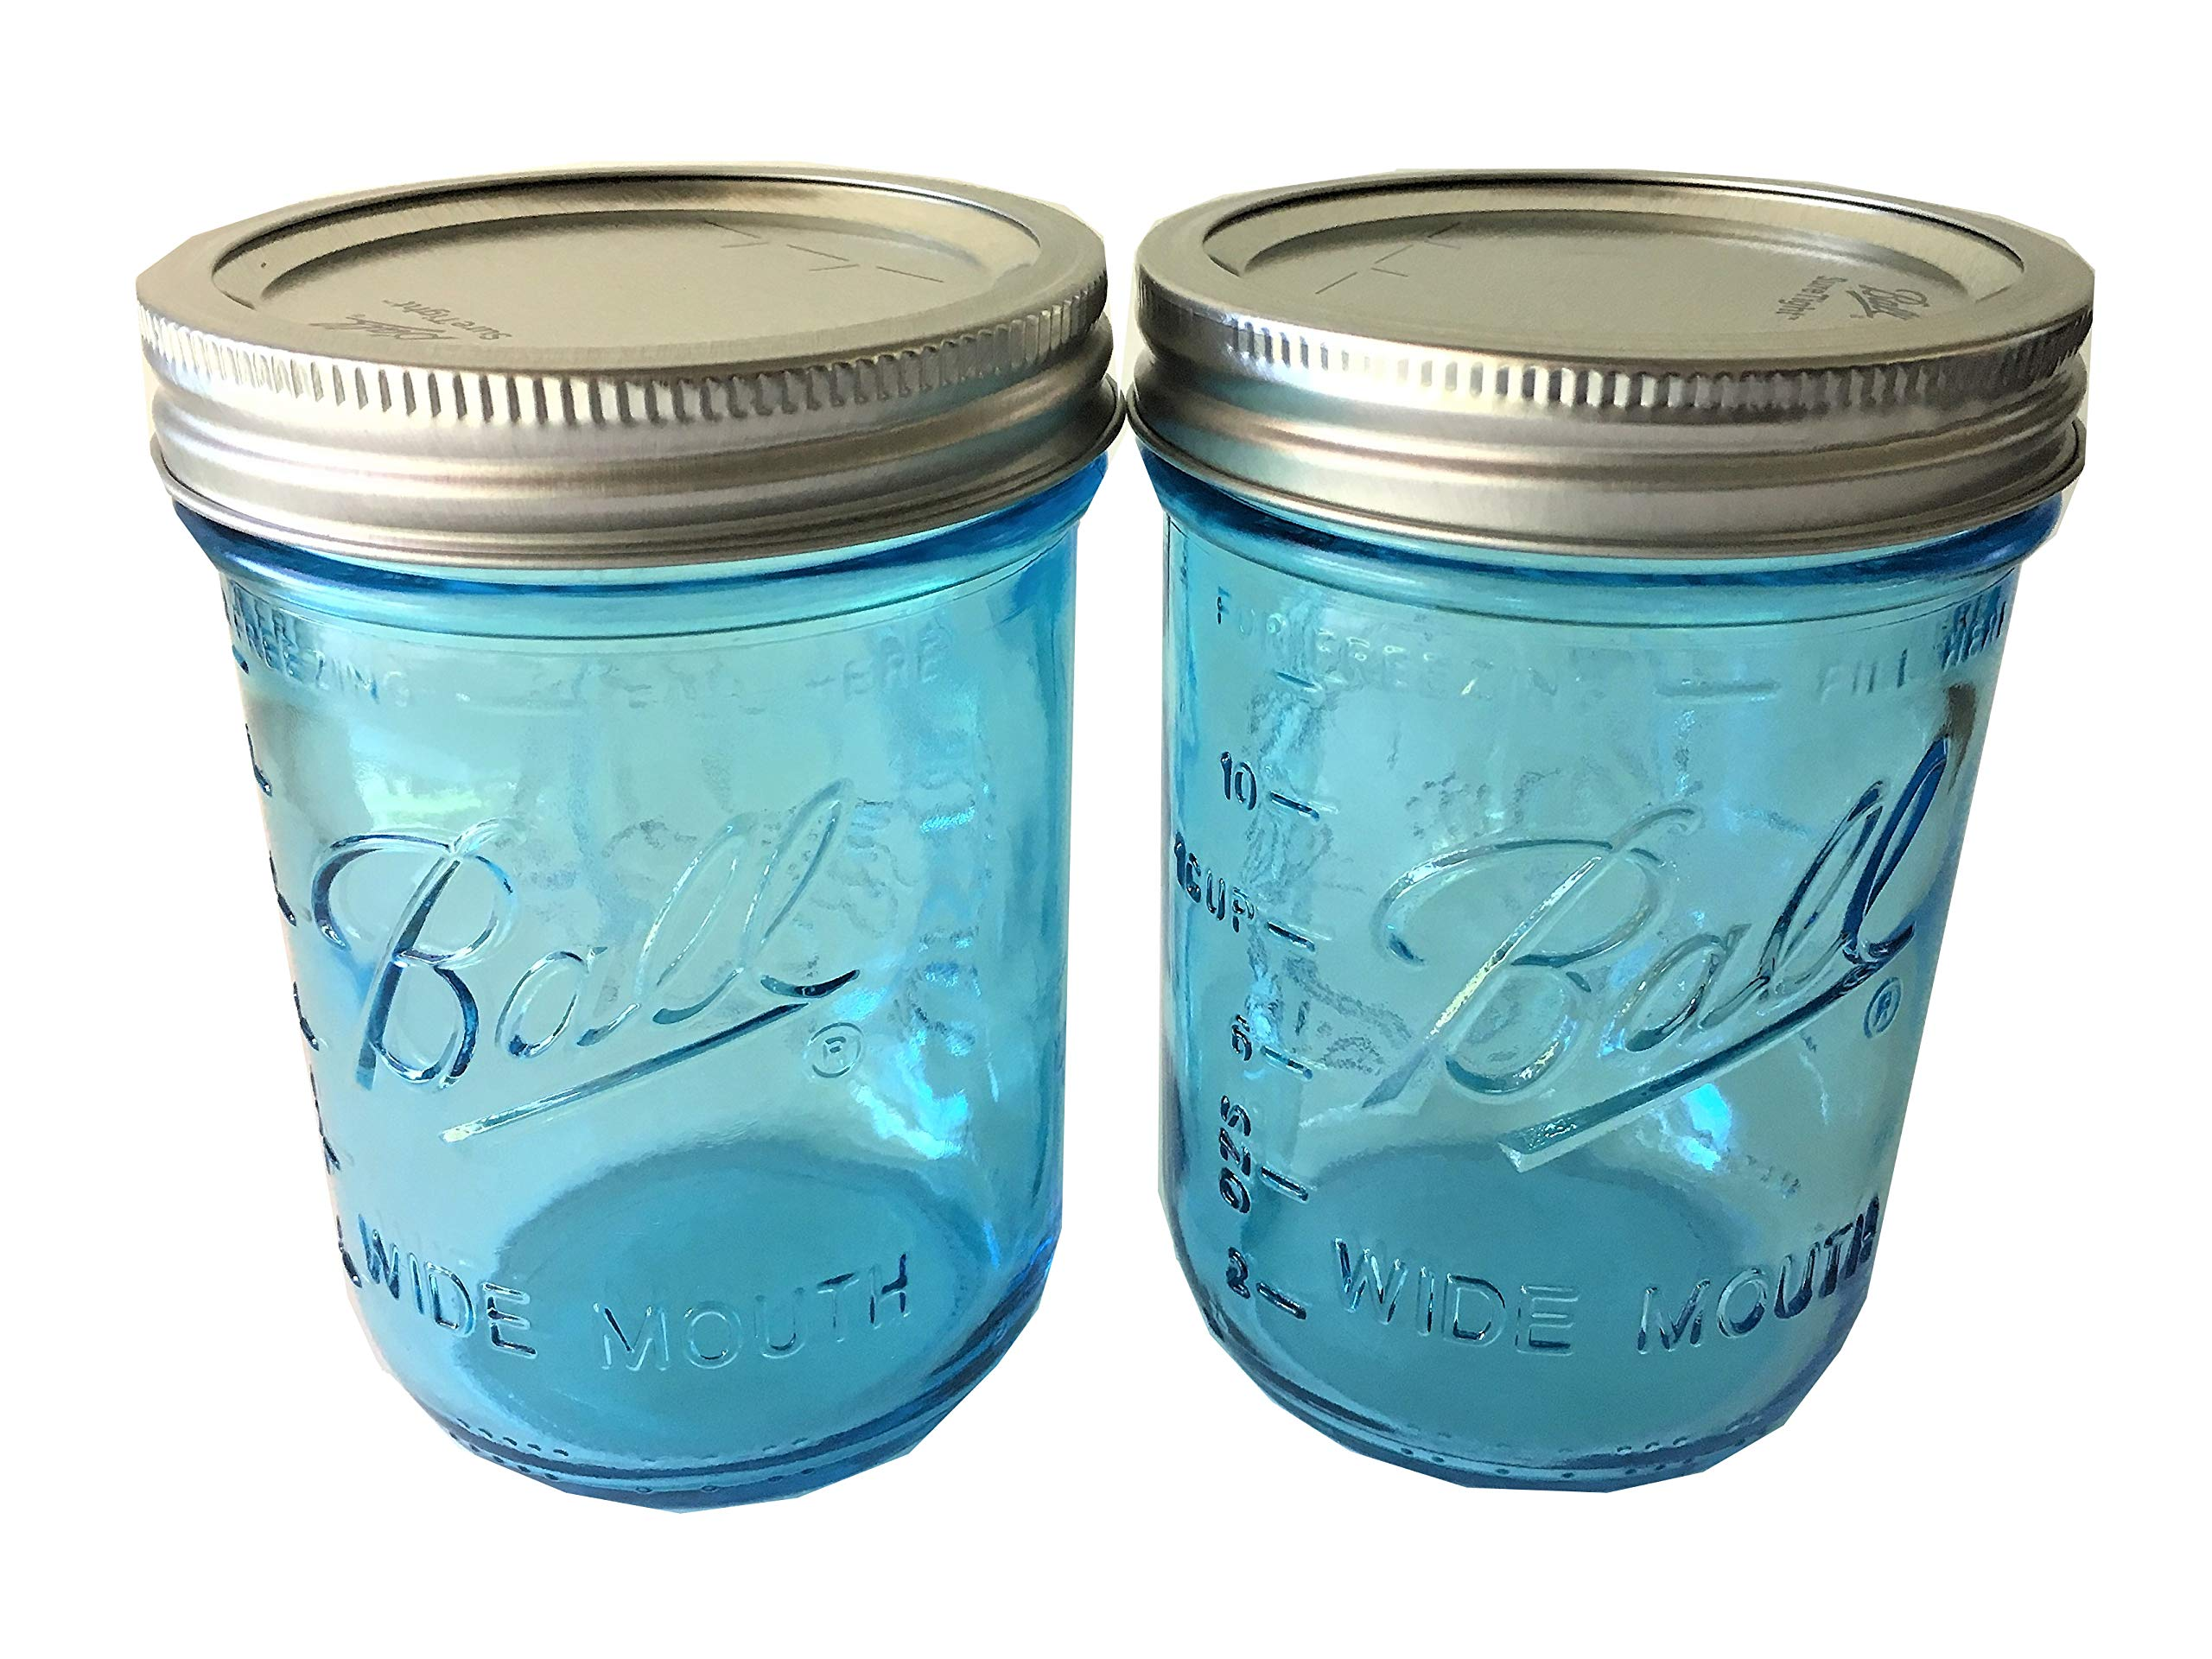 Ball Mason Jar-16 oz. Aqua Blue Glass Wide Mouth - Set of 2